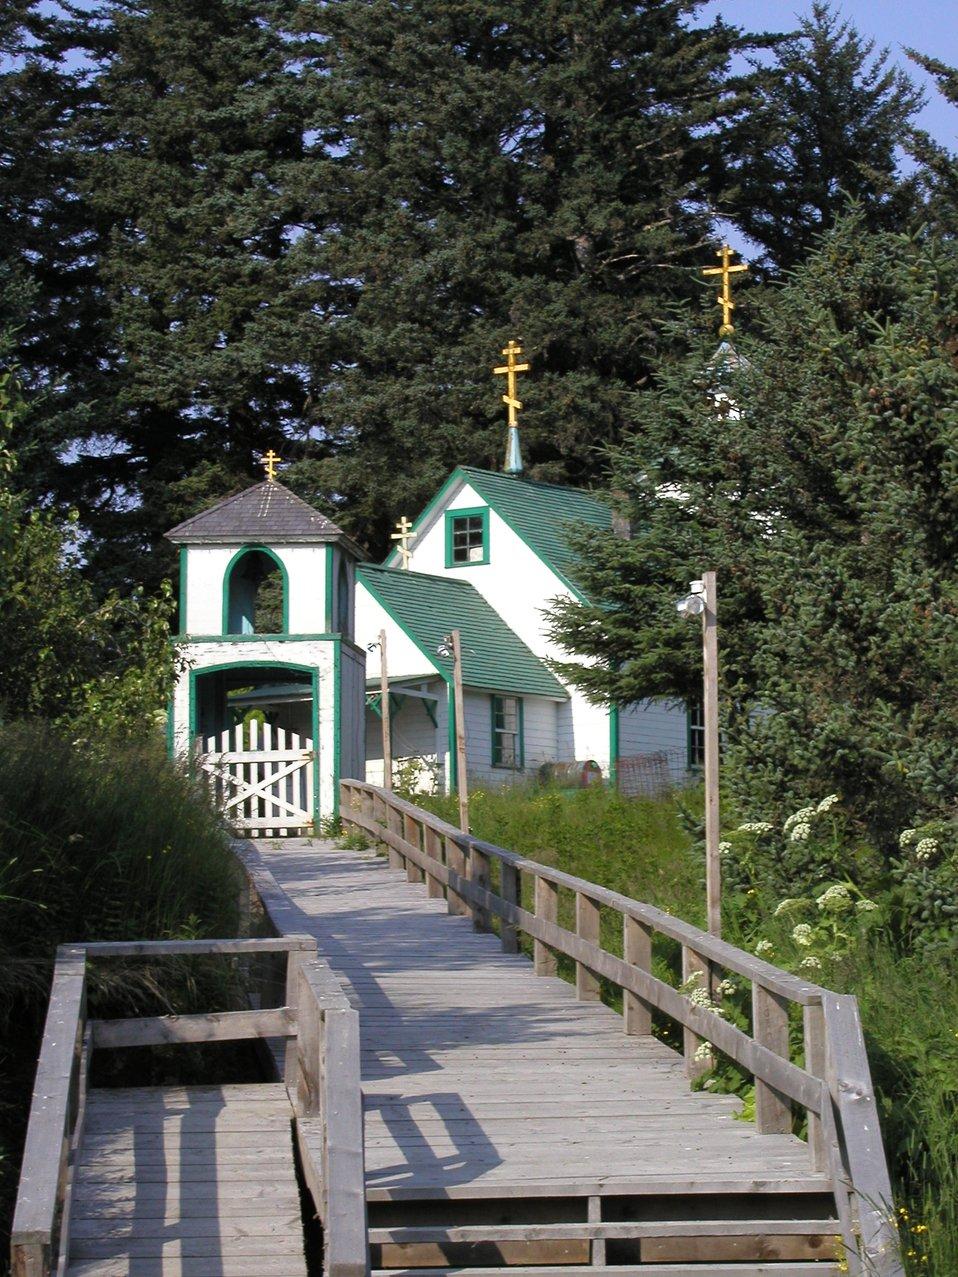 The Russian Orthodox Church on Spruce Island